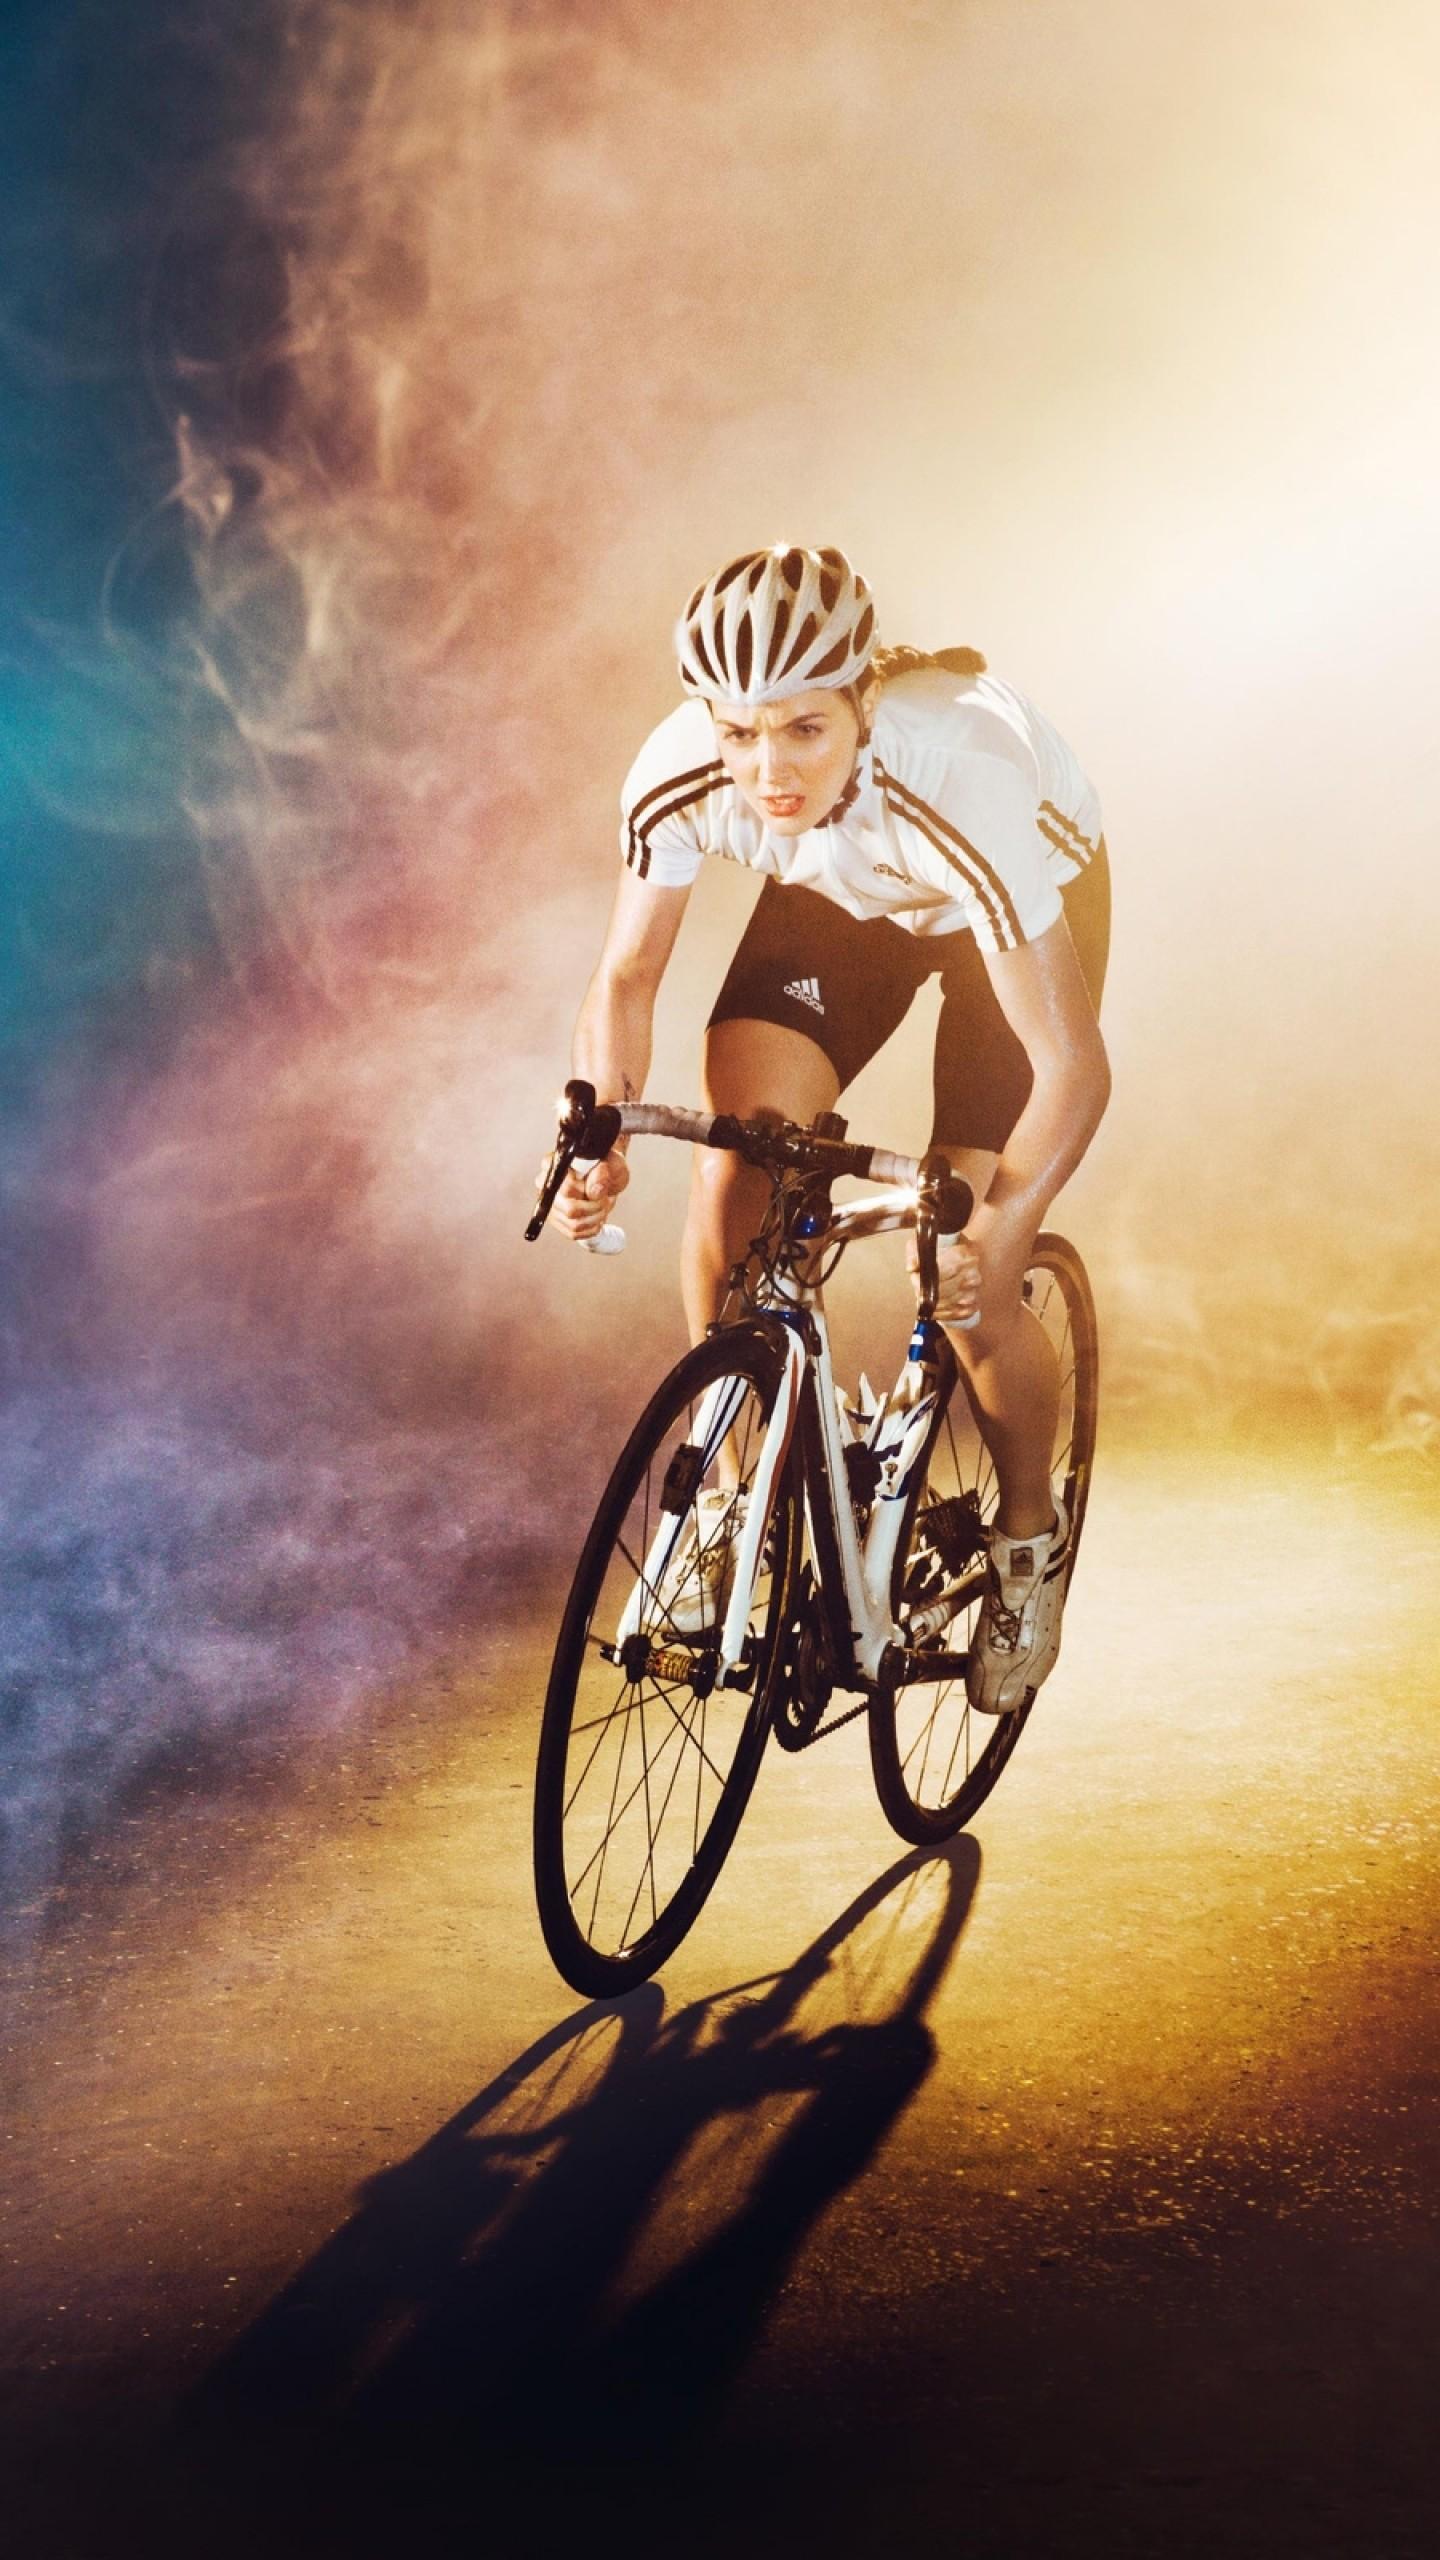 Wallpaper girl, contest, bike